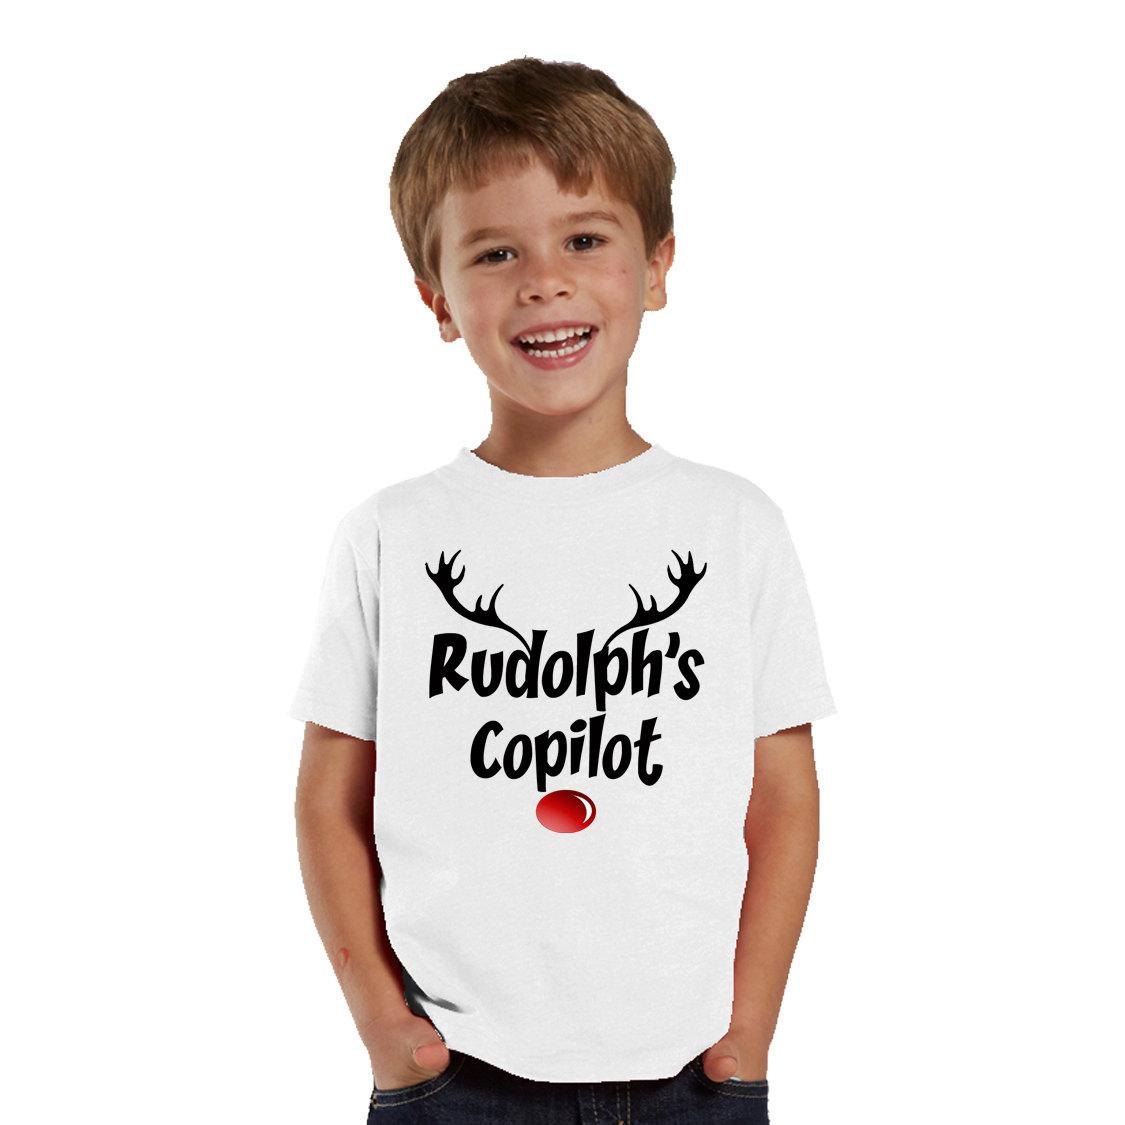 53ff79d1ce1 Rudolph s Copilot Kids T-Shirt